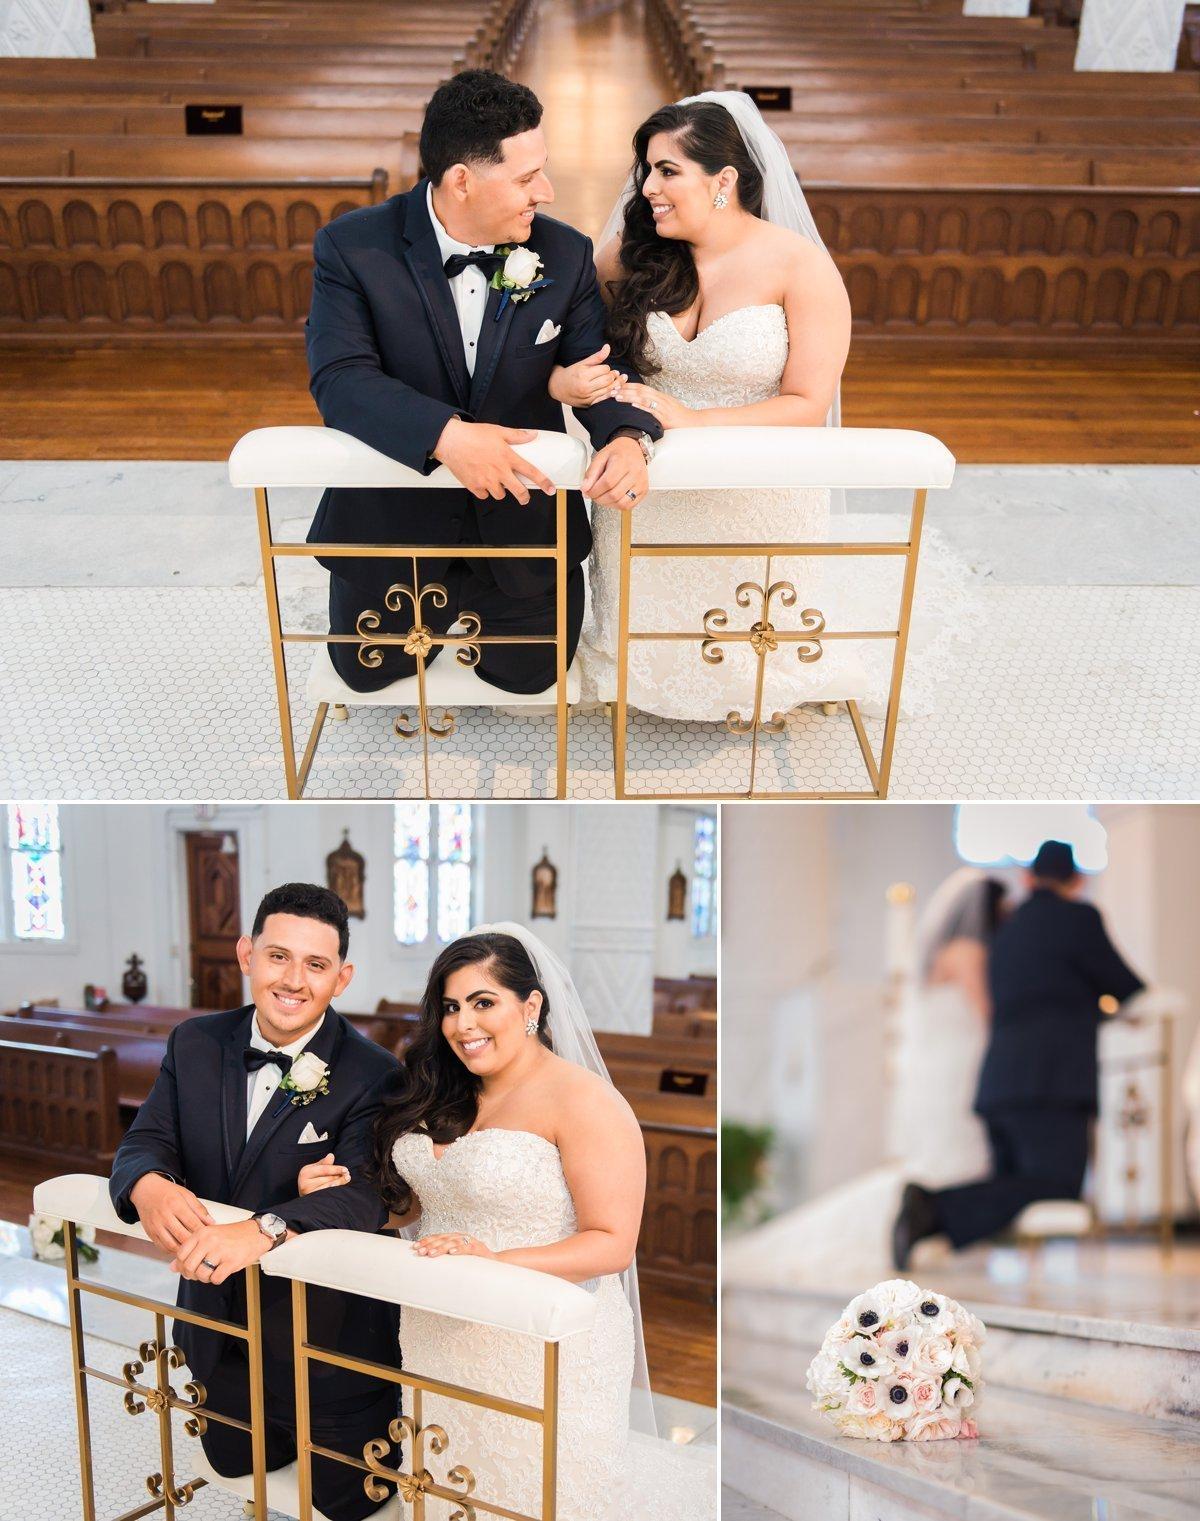 Monica-JJ Wedding 35